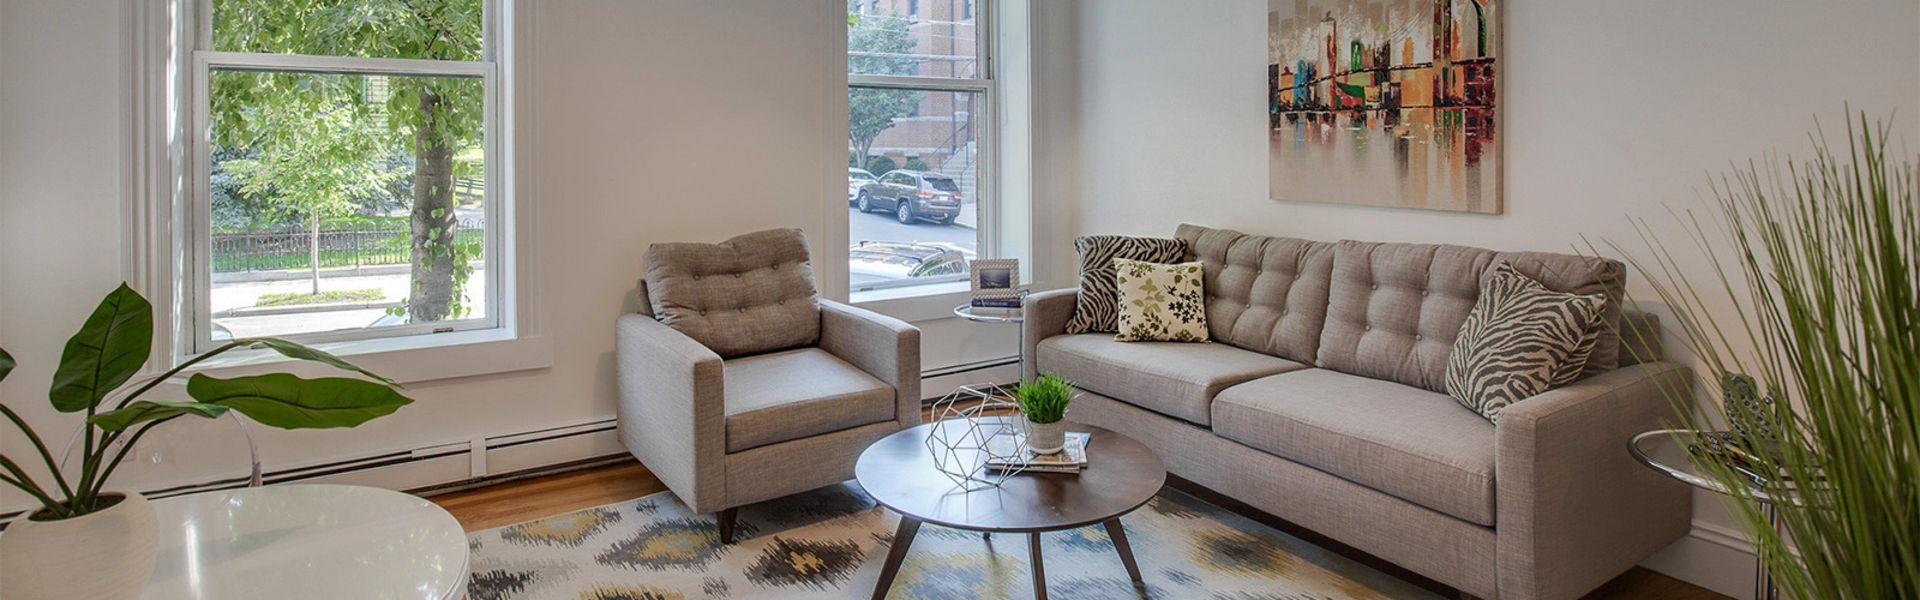 412 Sumner Street, Unit 1 – New East Boston Rental!